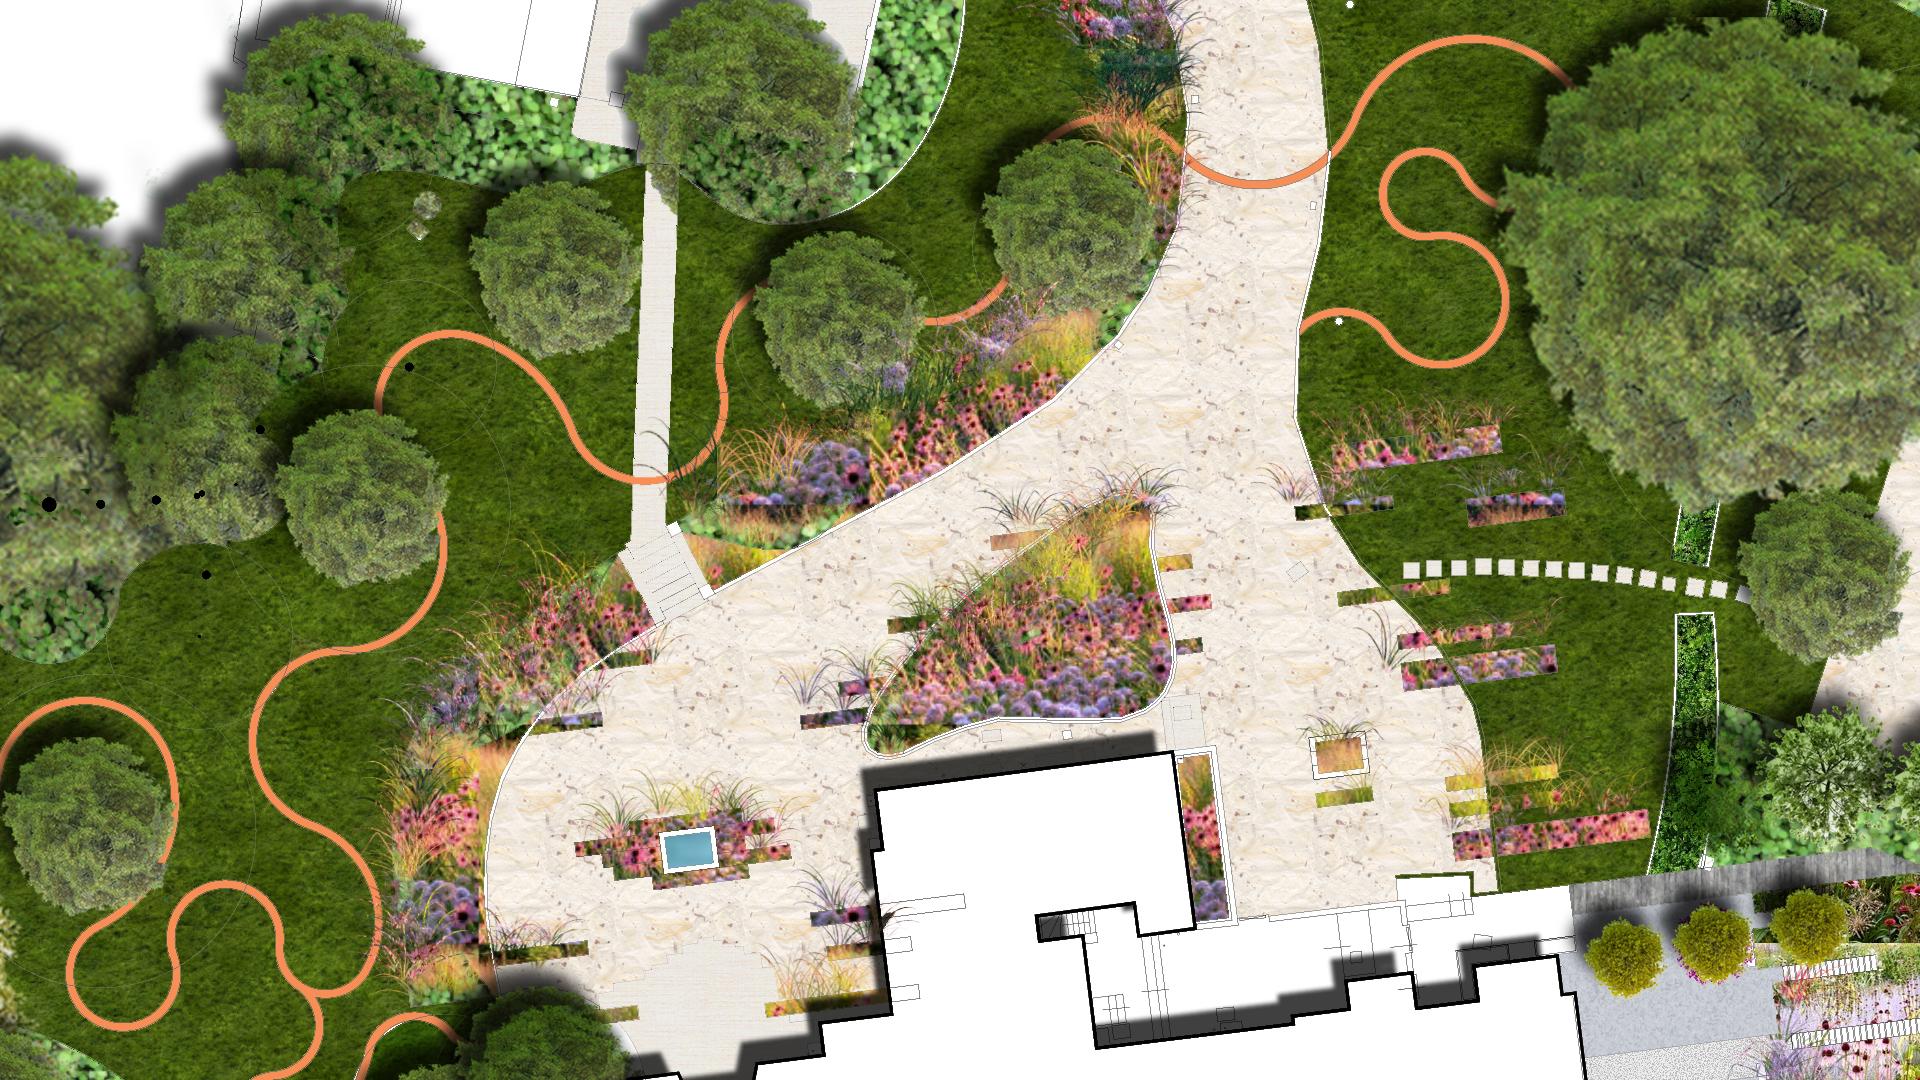 Residential Landscape Masterplan Concept Landscape